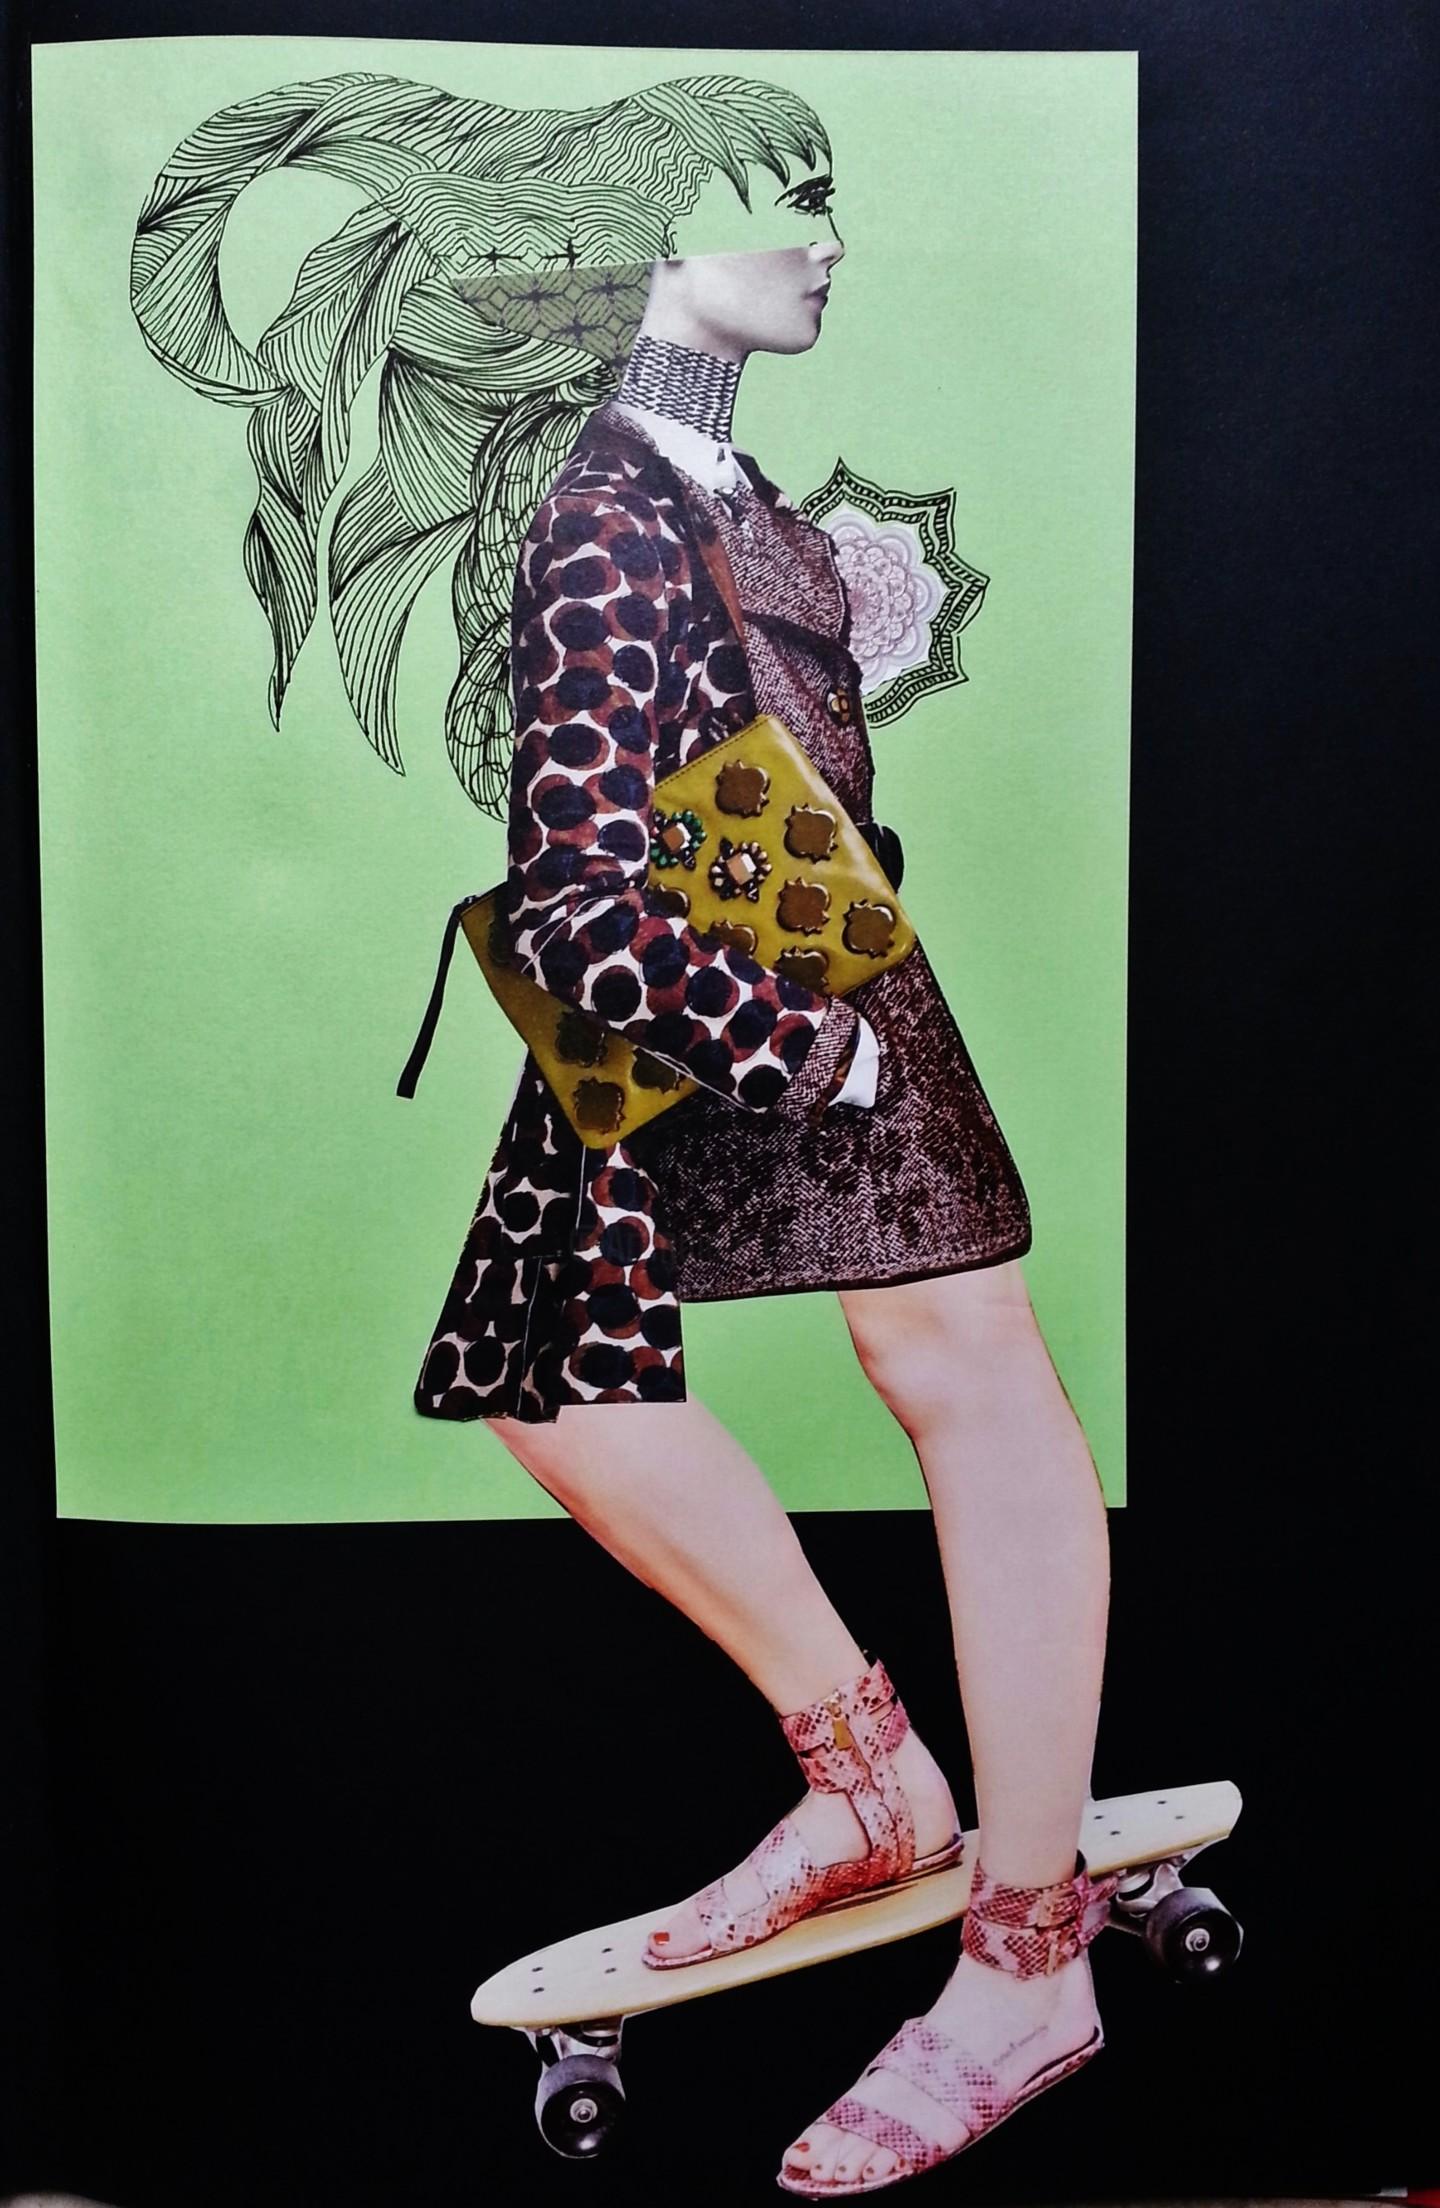 Brigitte Mathé (MBL) - Rolling Woman